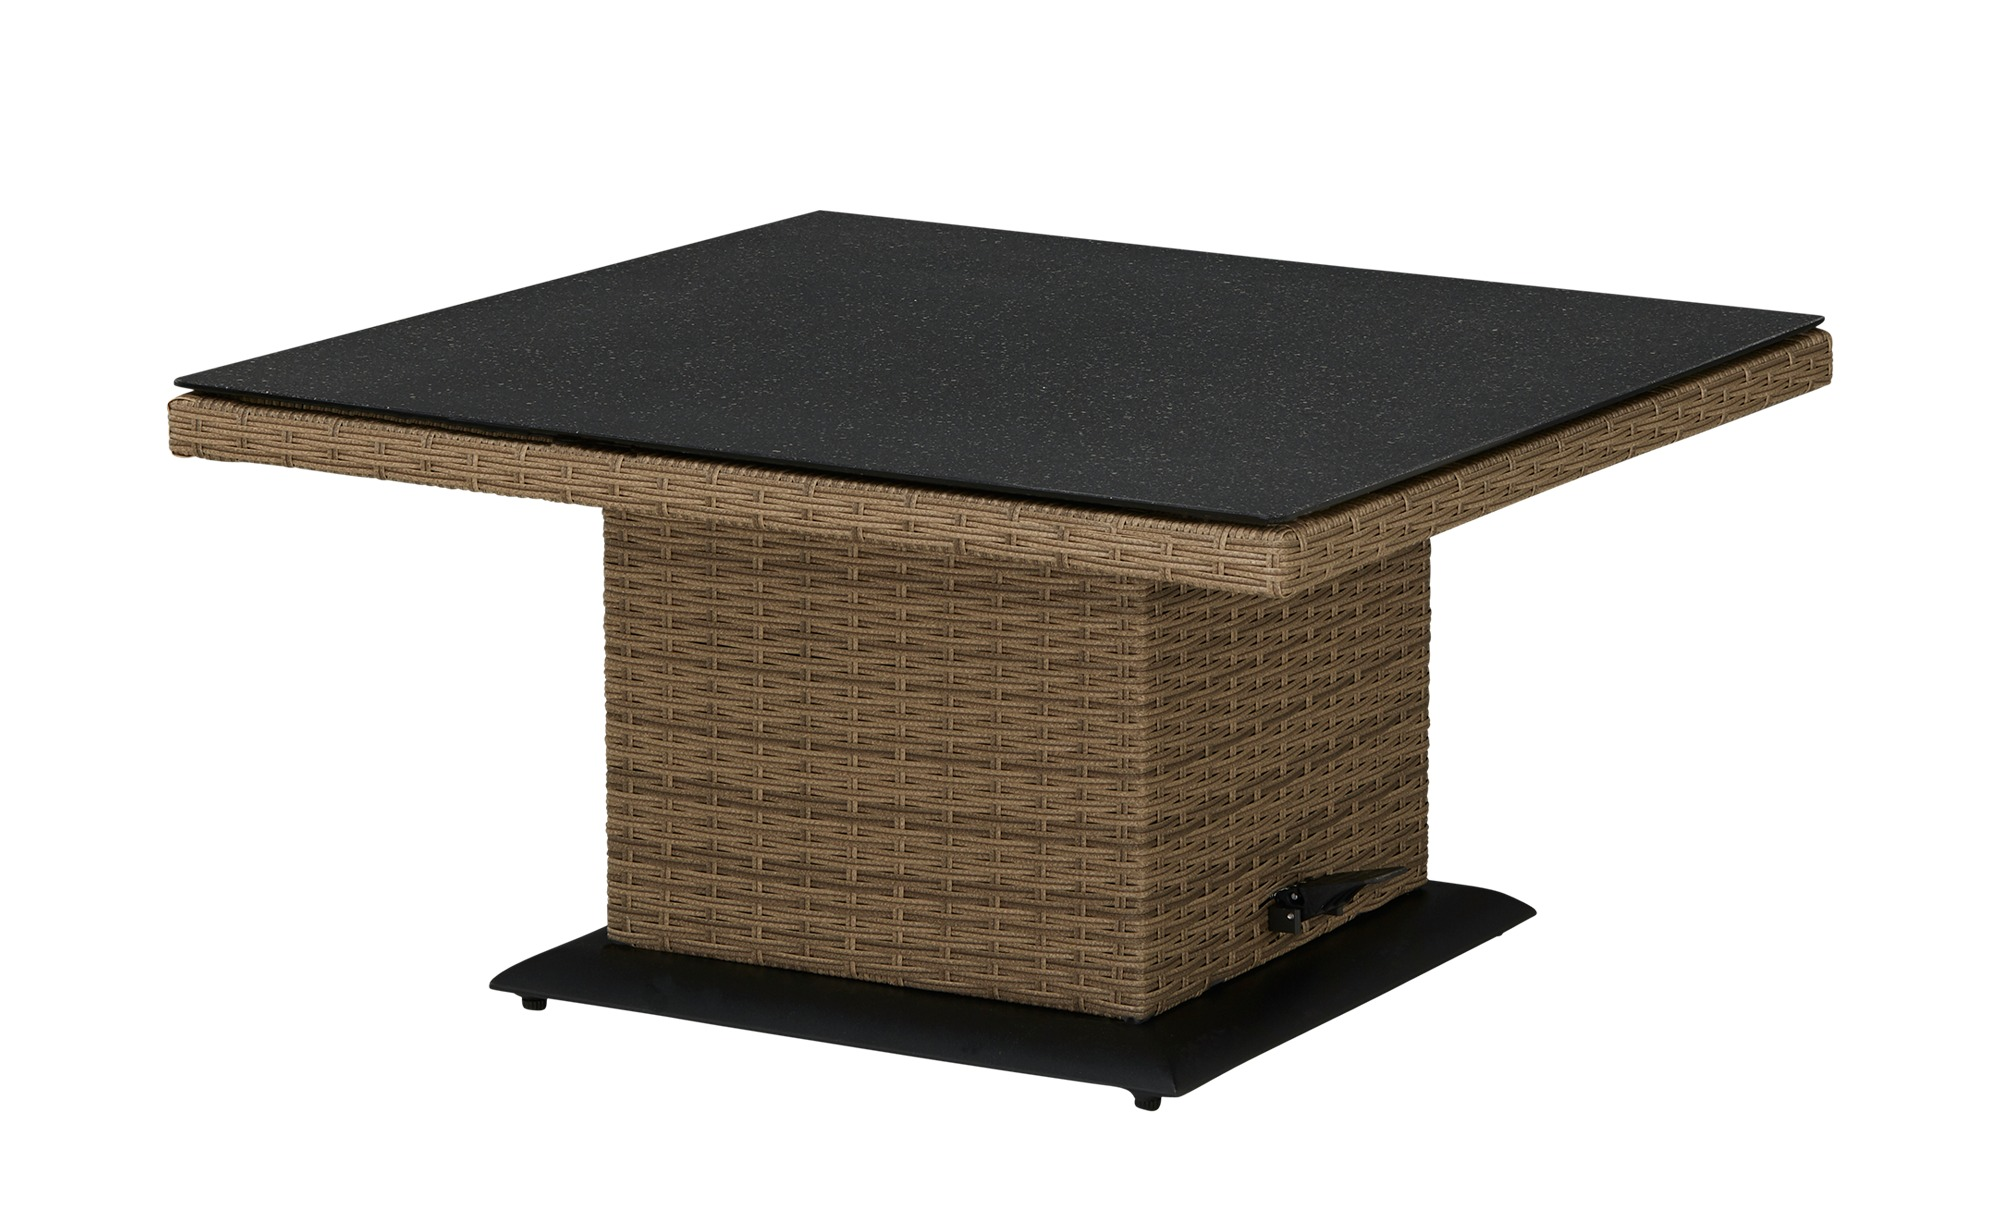 a casa mia Lift-Tisch   Florenz / Ibiza ¦ braun ¦ Aluminium pulverbeschichtet/ PE-Geflecht ¦ Maße (cm): B: 90 H: 47 Garten > Gartenmöbel > Gartentische - Höffner